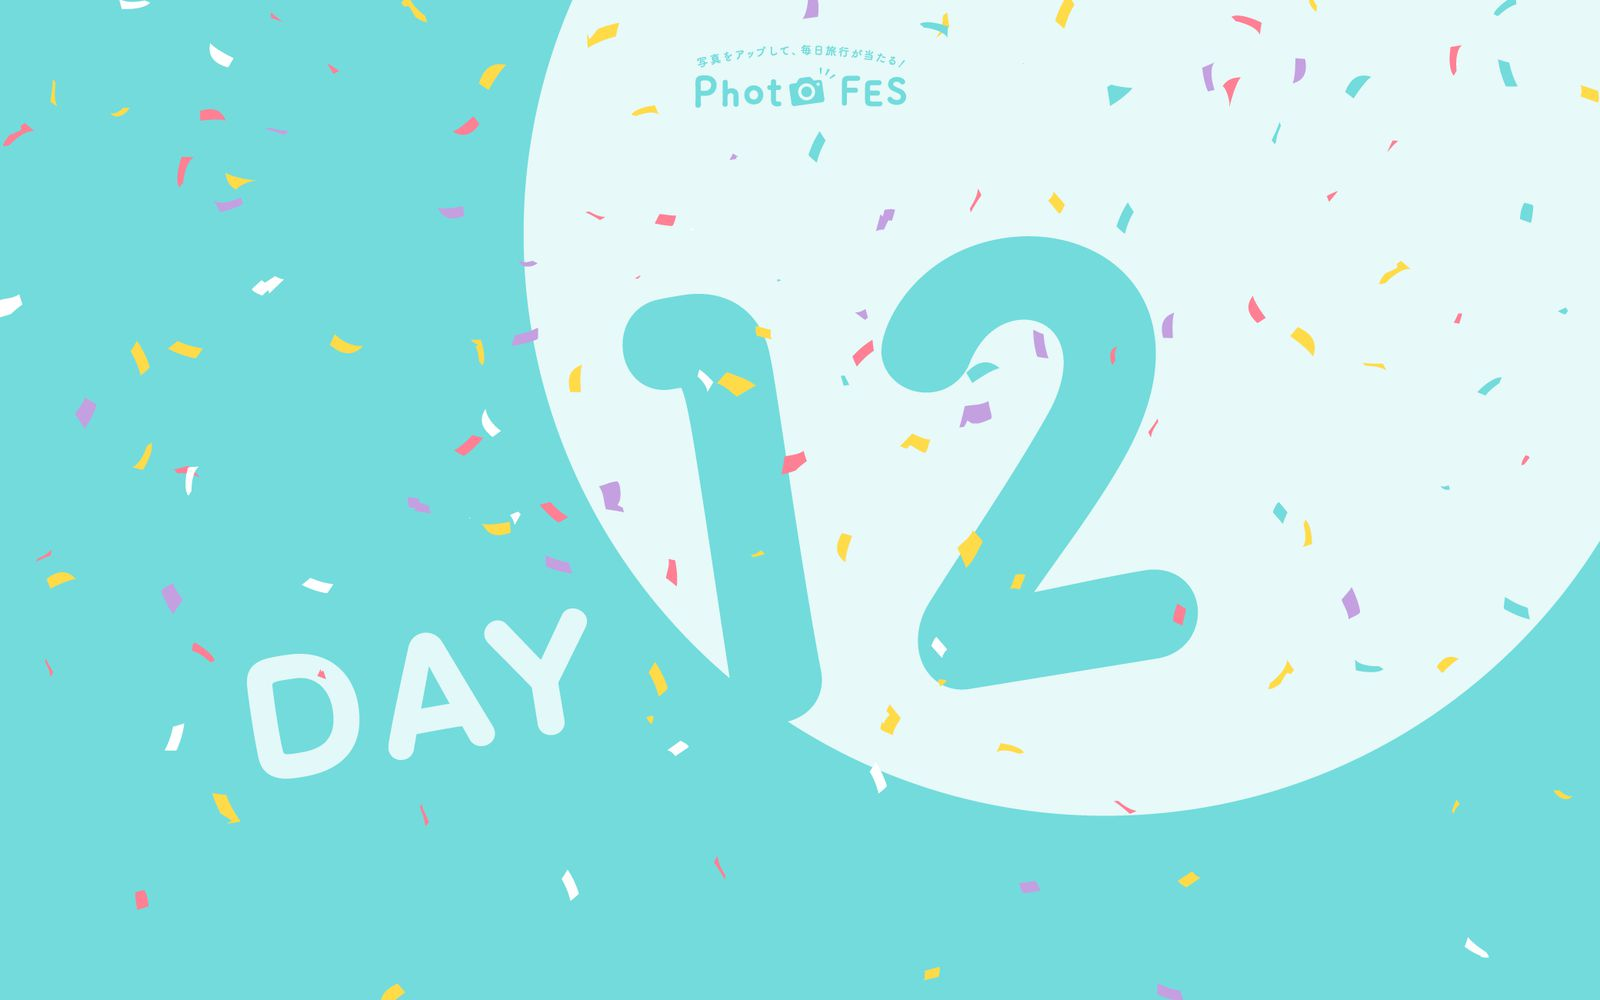 【DAY12】「Photo FES Summer シーズン2」8月28日投稿分であたる賞品&受賞者発表